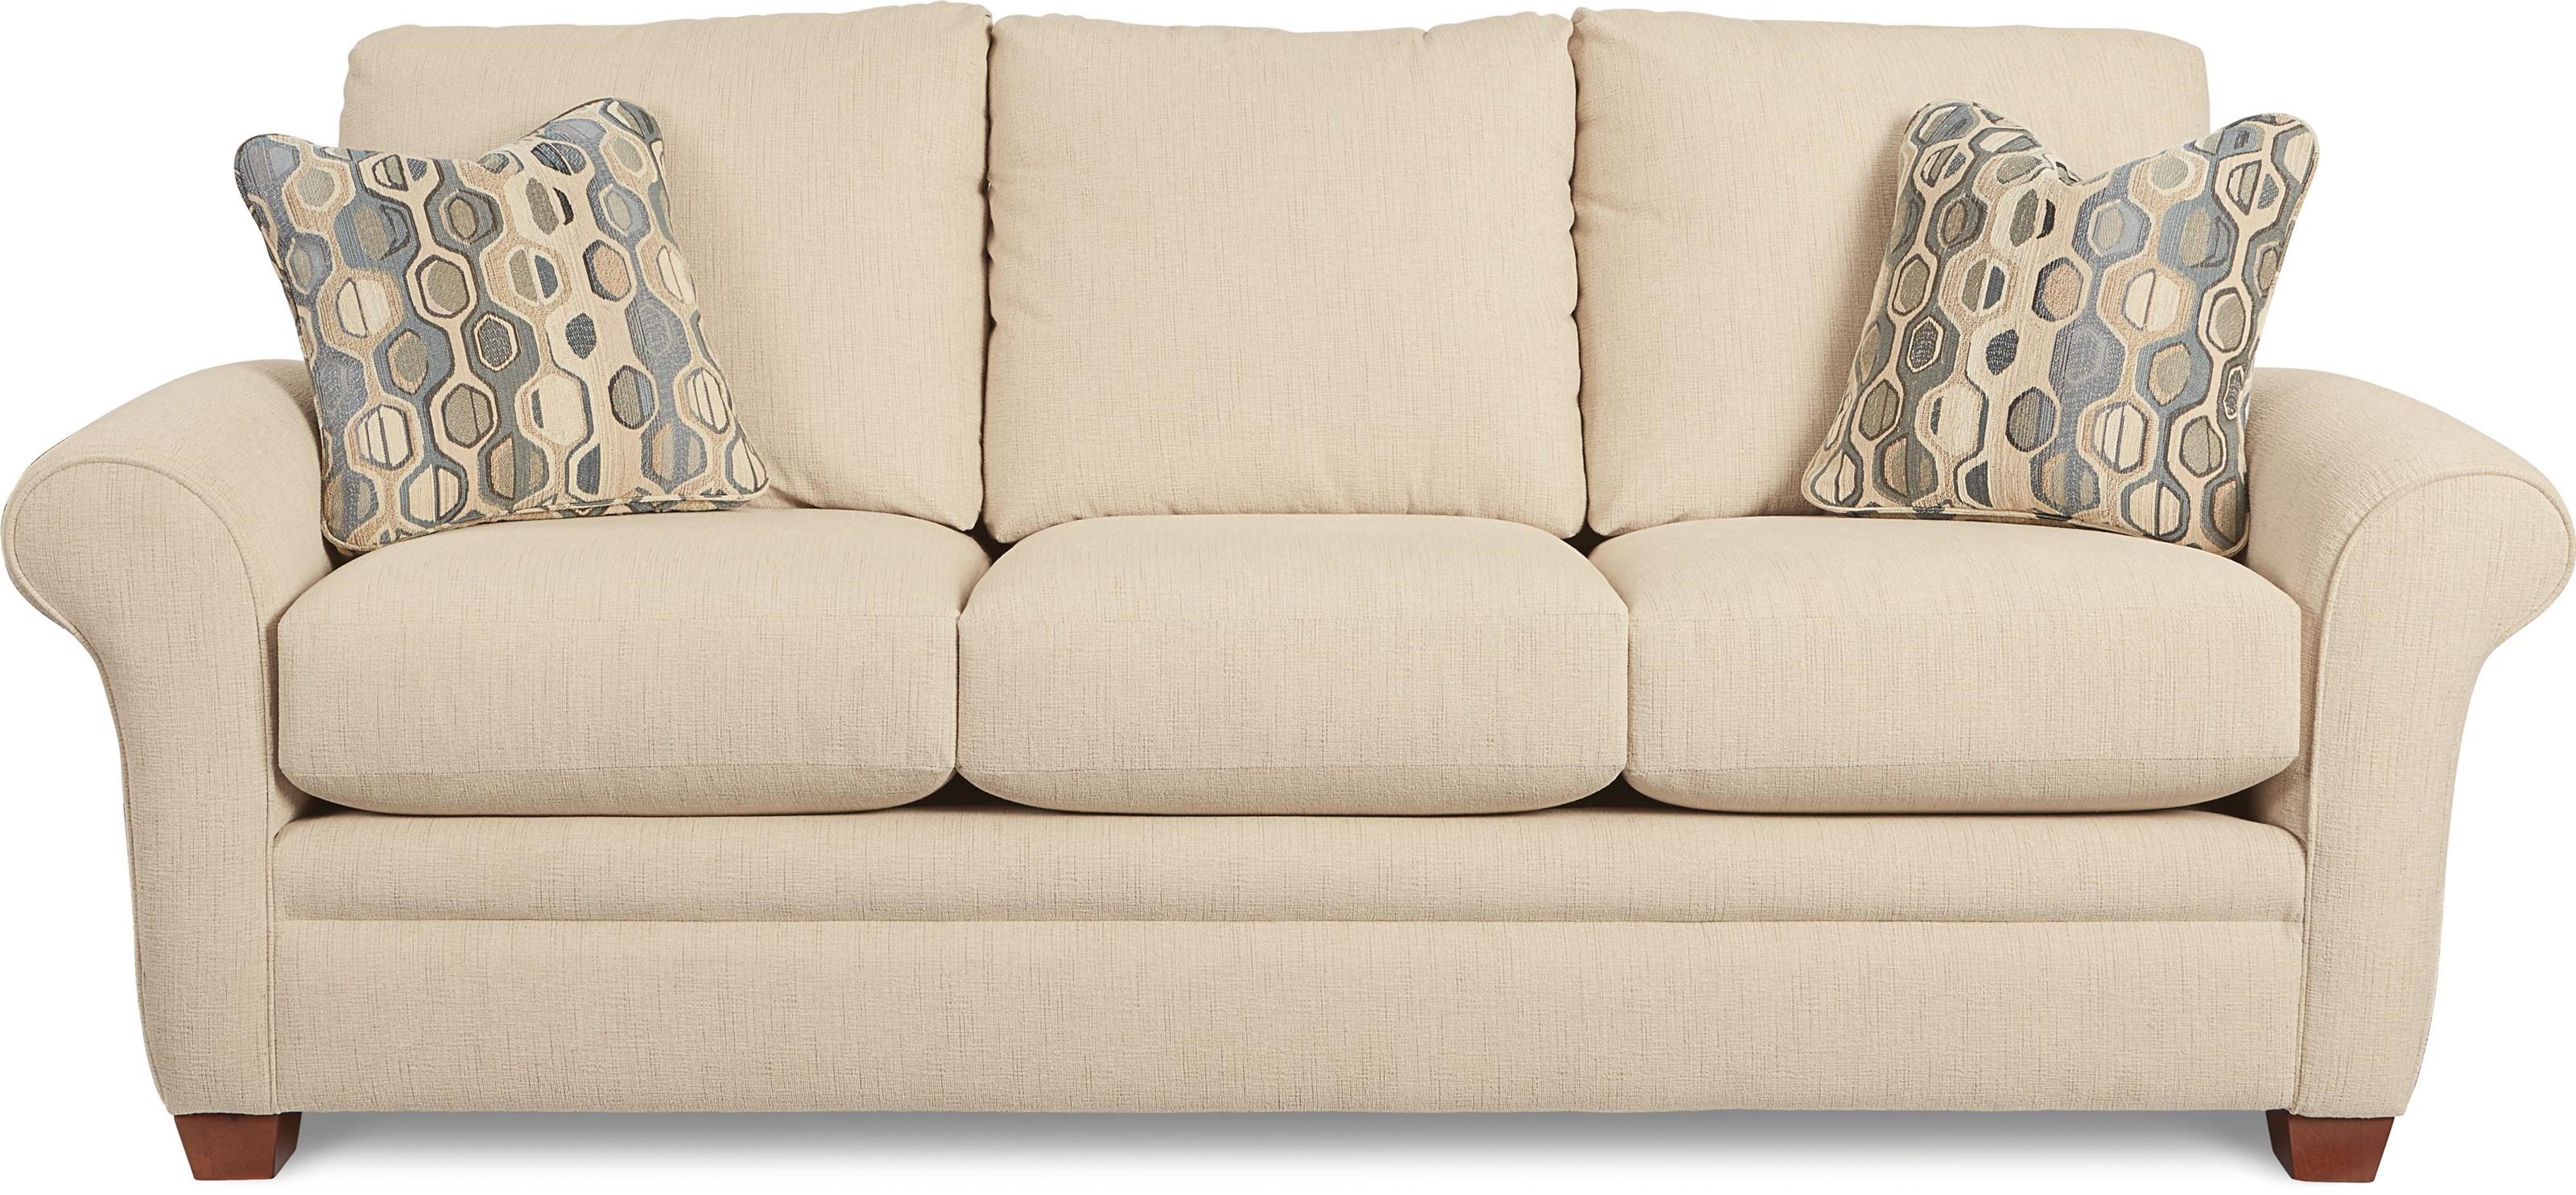 moss studio sofa reviews sectional sofas brown s furniture natalie – thesofa